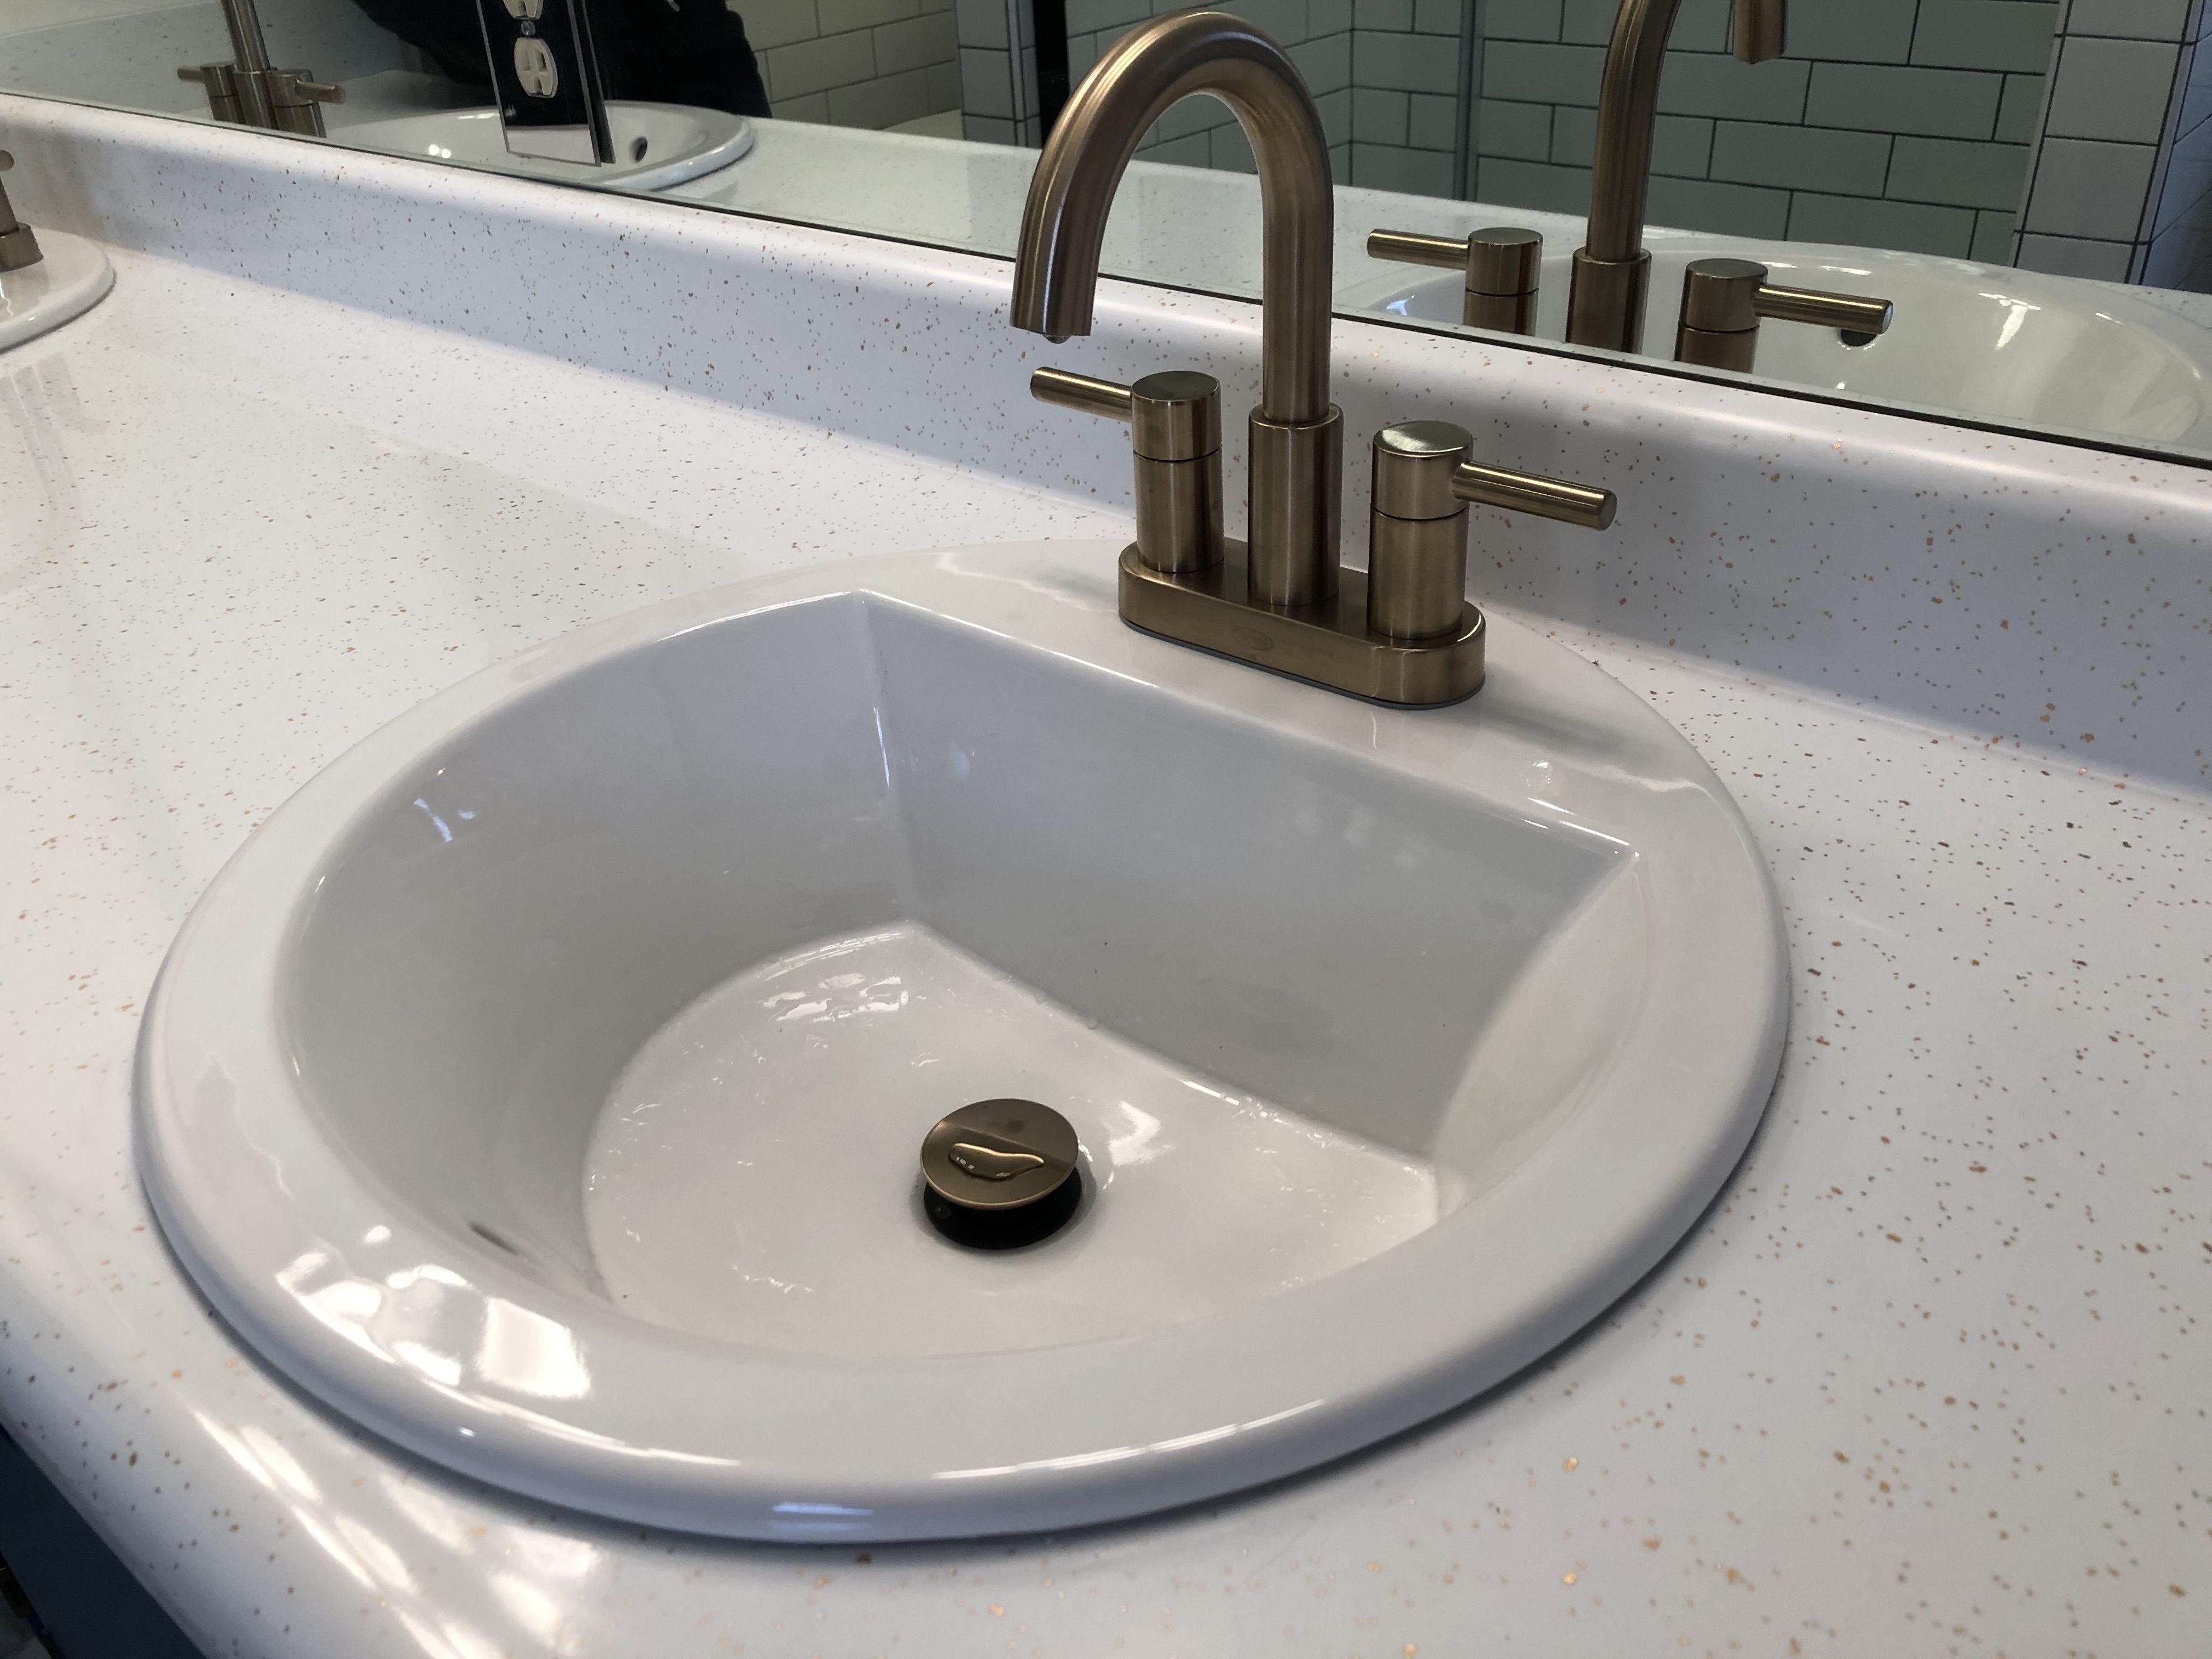 Kohler Bryant White Drop In Round Bathroom Sink With Overflow Drain 18 875 In X 18 875 In Lowes Com Sink Bathroom Sink Round Sink How to install a drop in bathroom sink